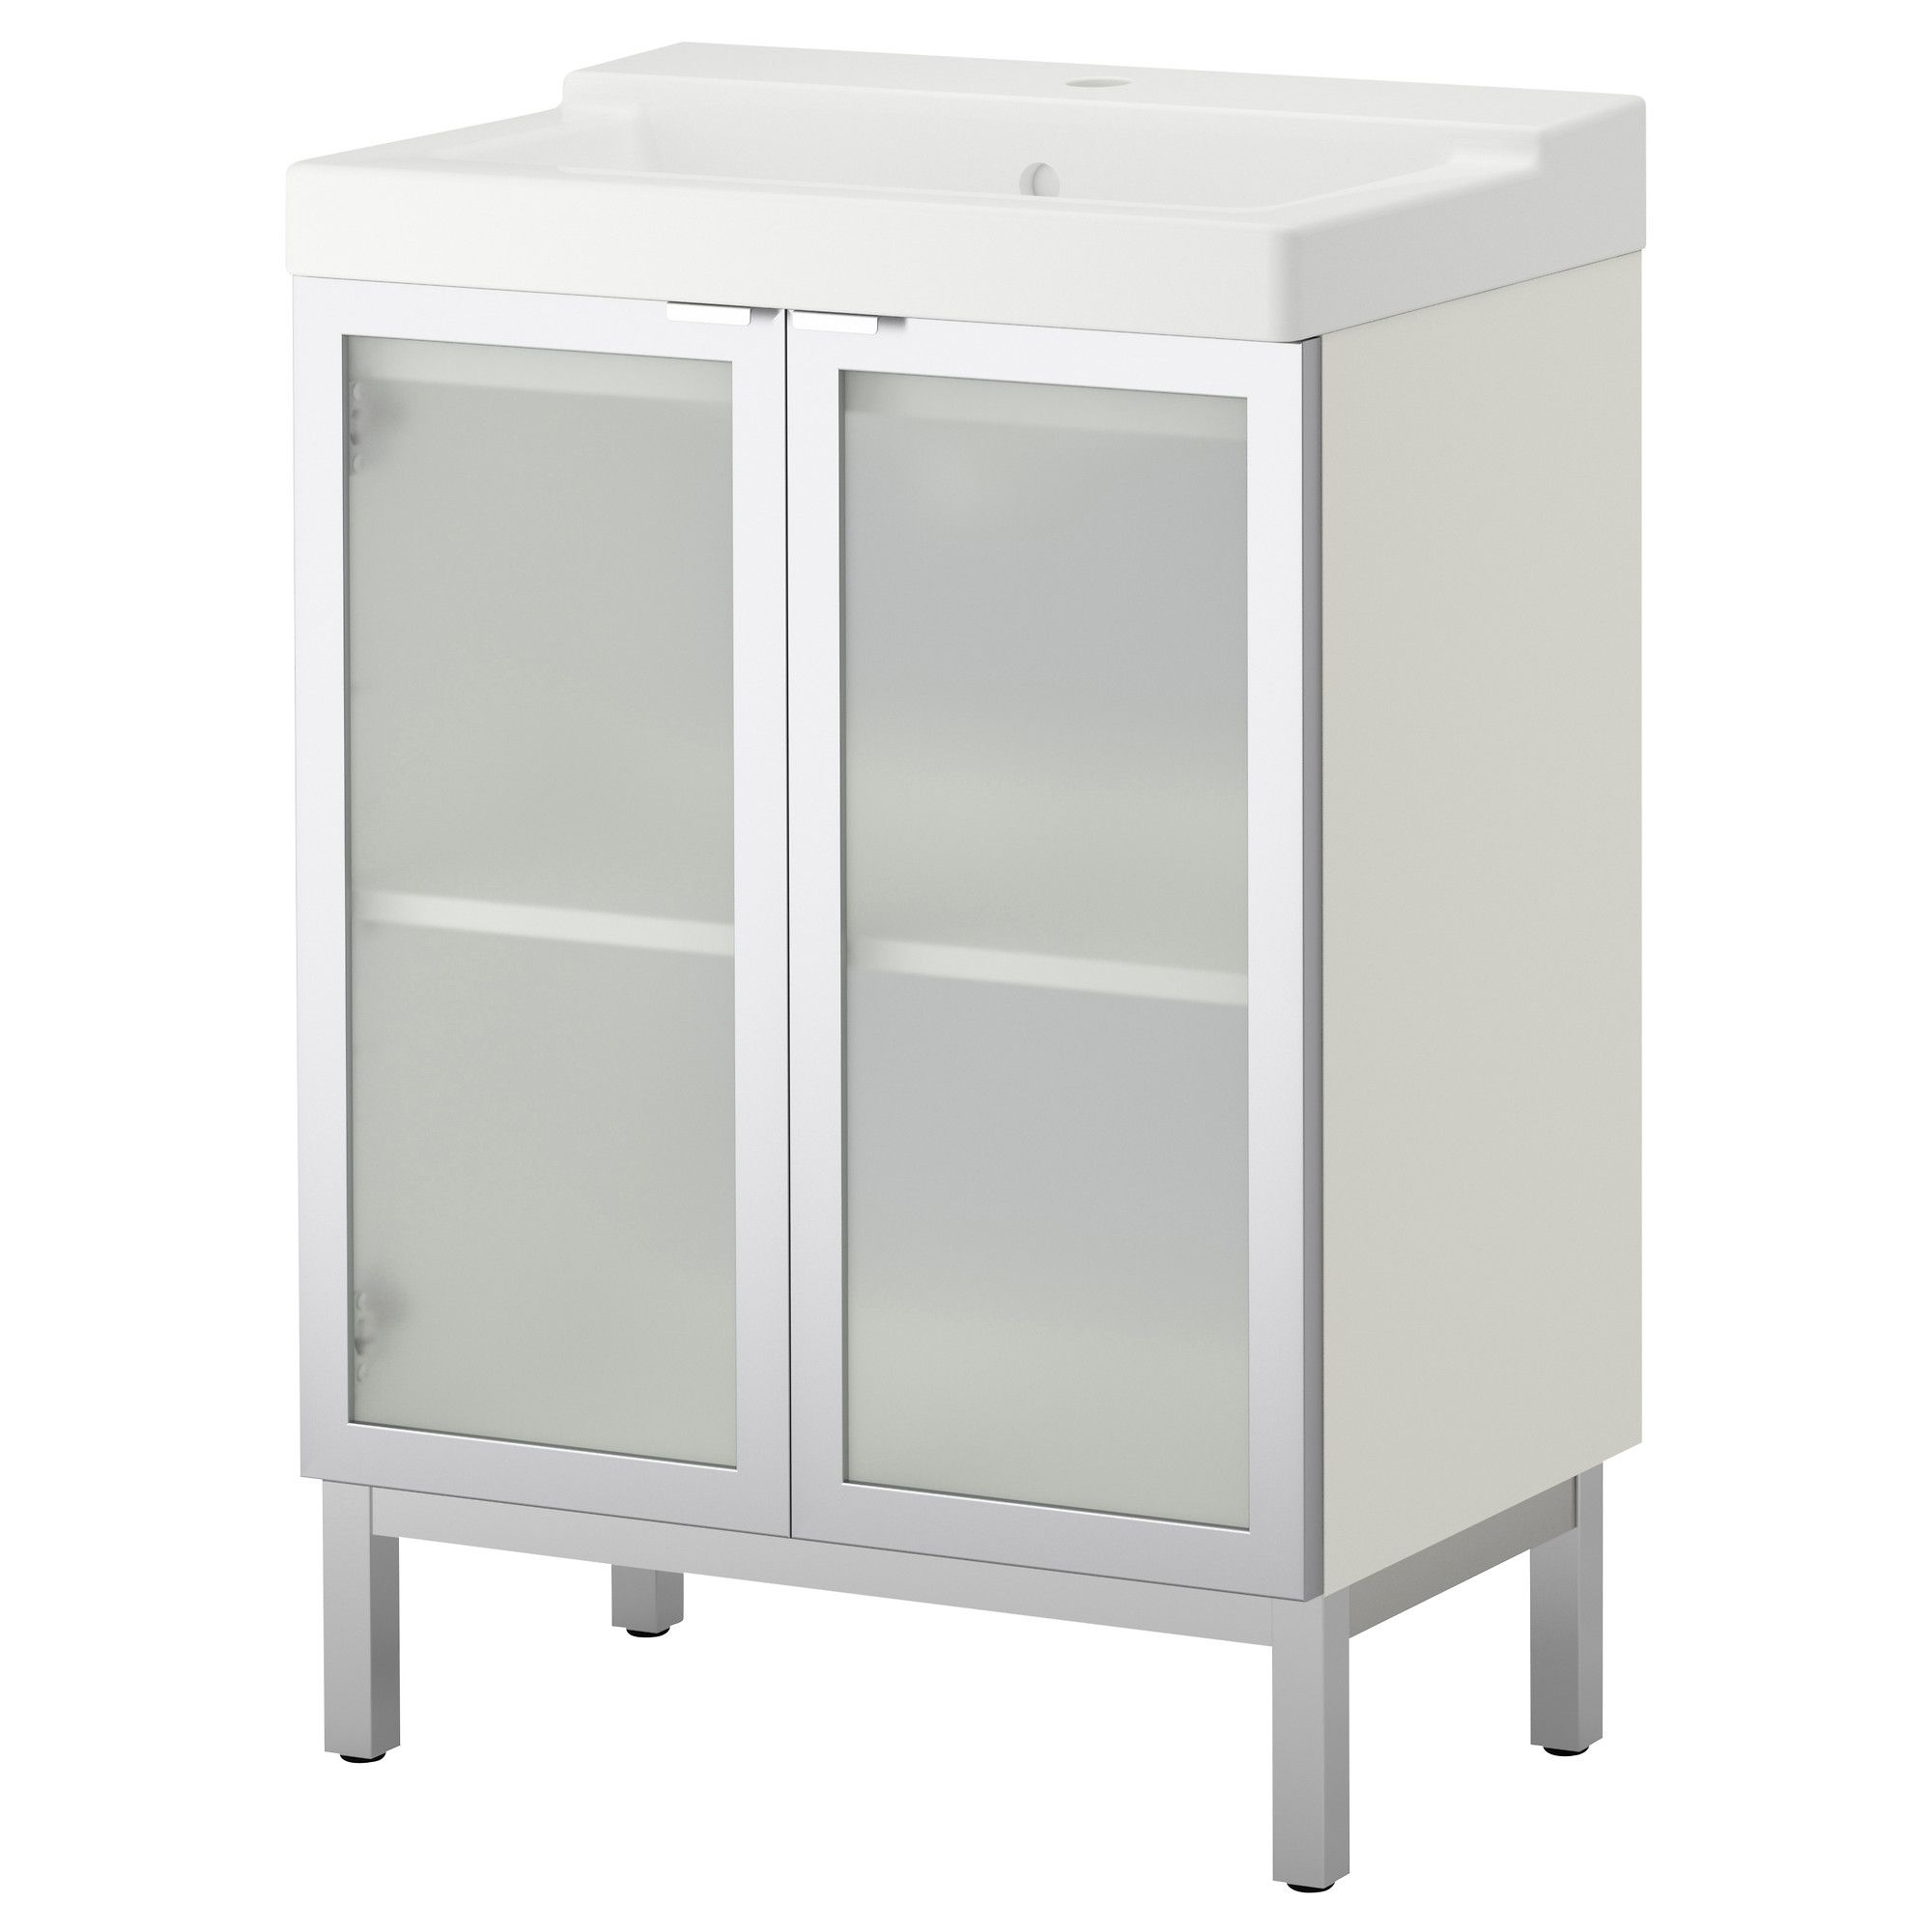 "LILL…NGEN T""LLEVIKEN Sink cabinet with 2 doors aluminum IKEA"